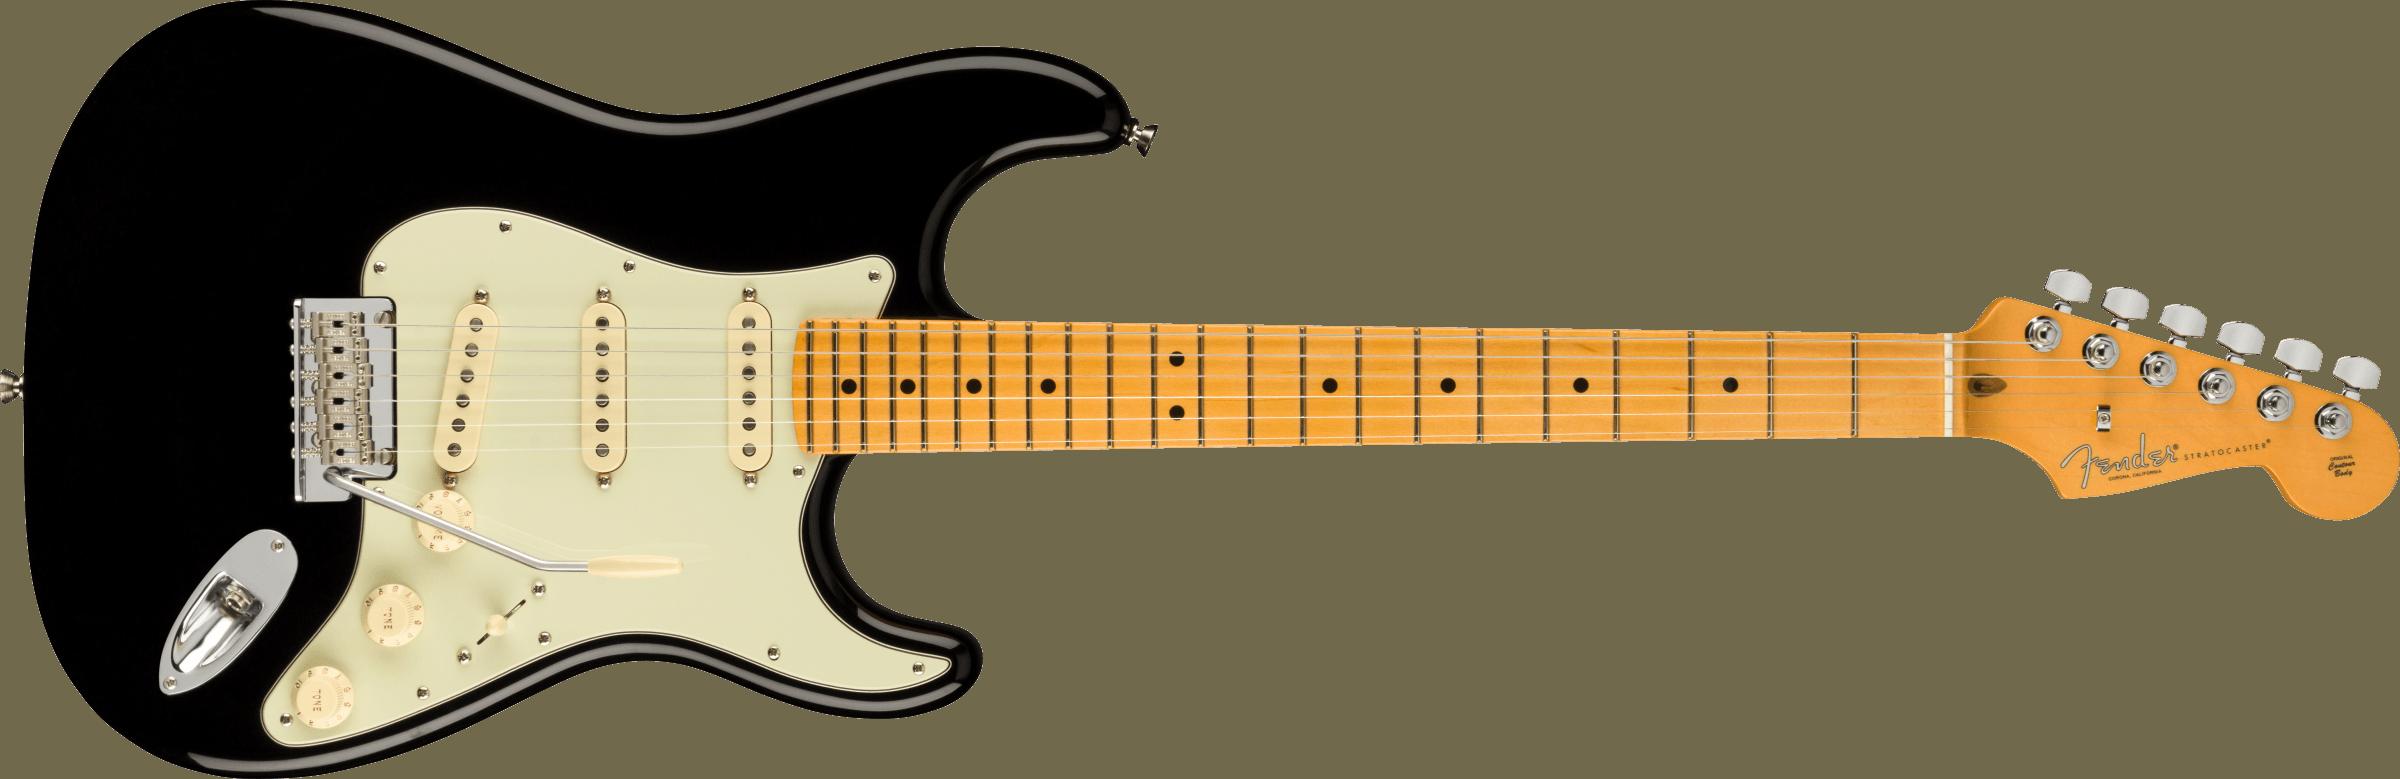 FENDER-American-Professional-II-Stratocaster-Maple-Fingerboard-Black-sku-571005528